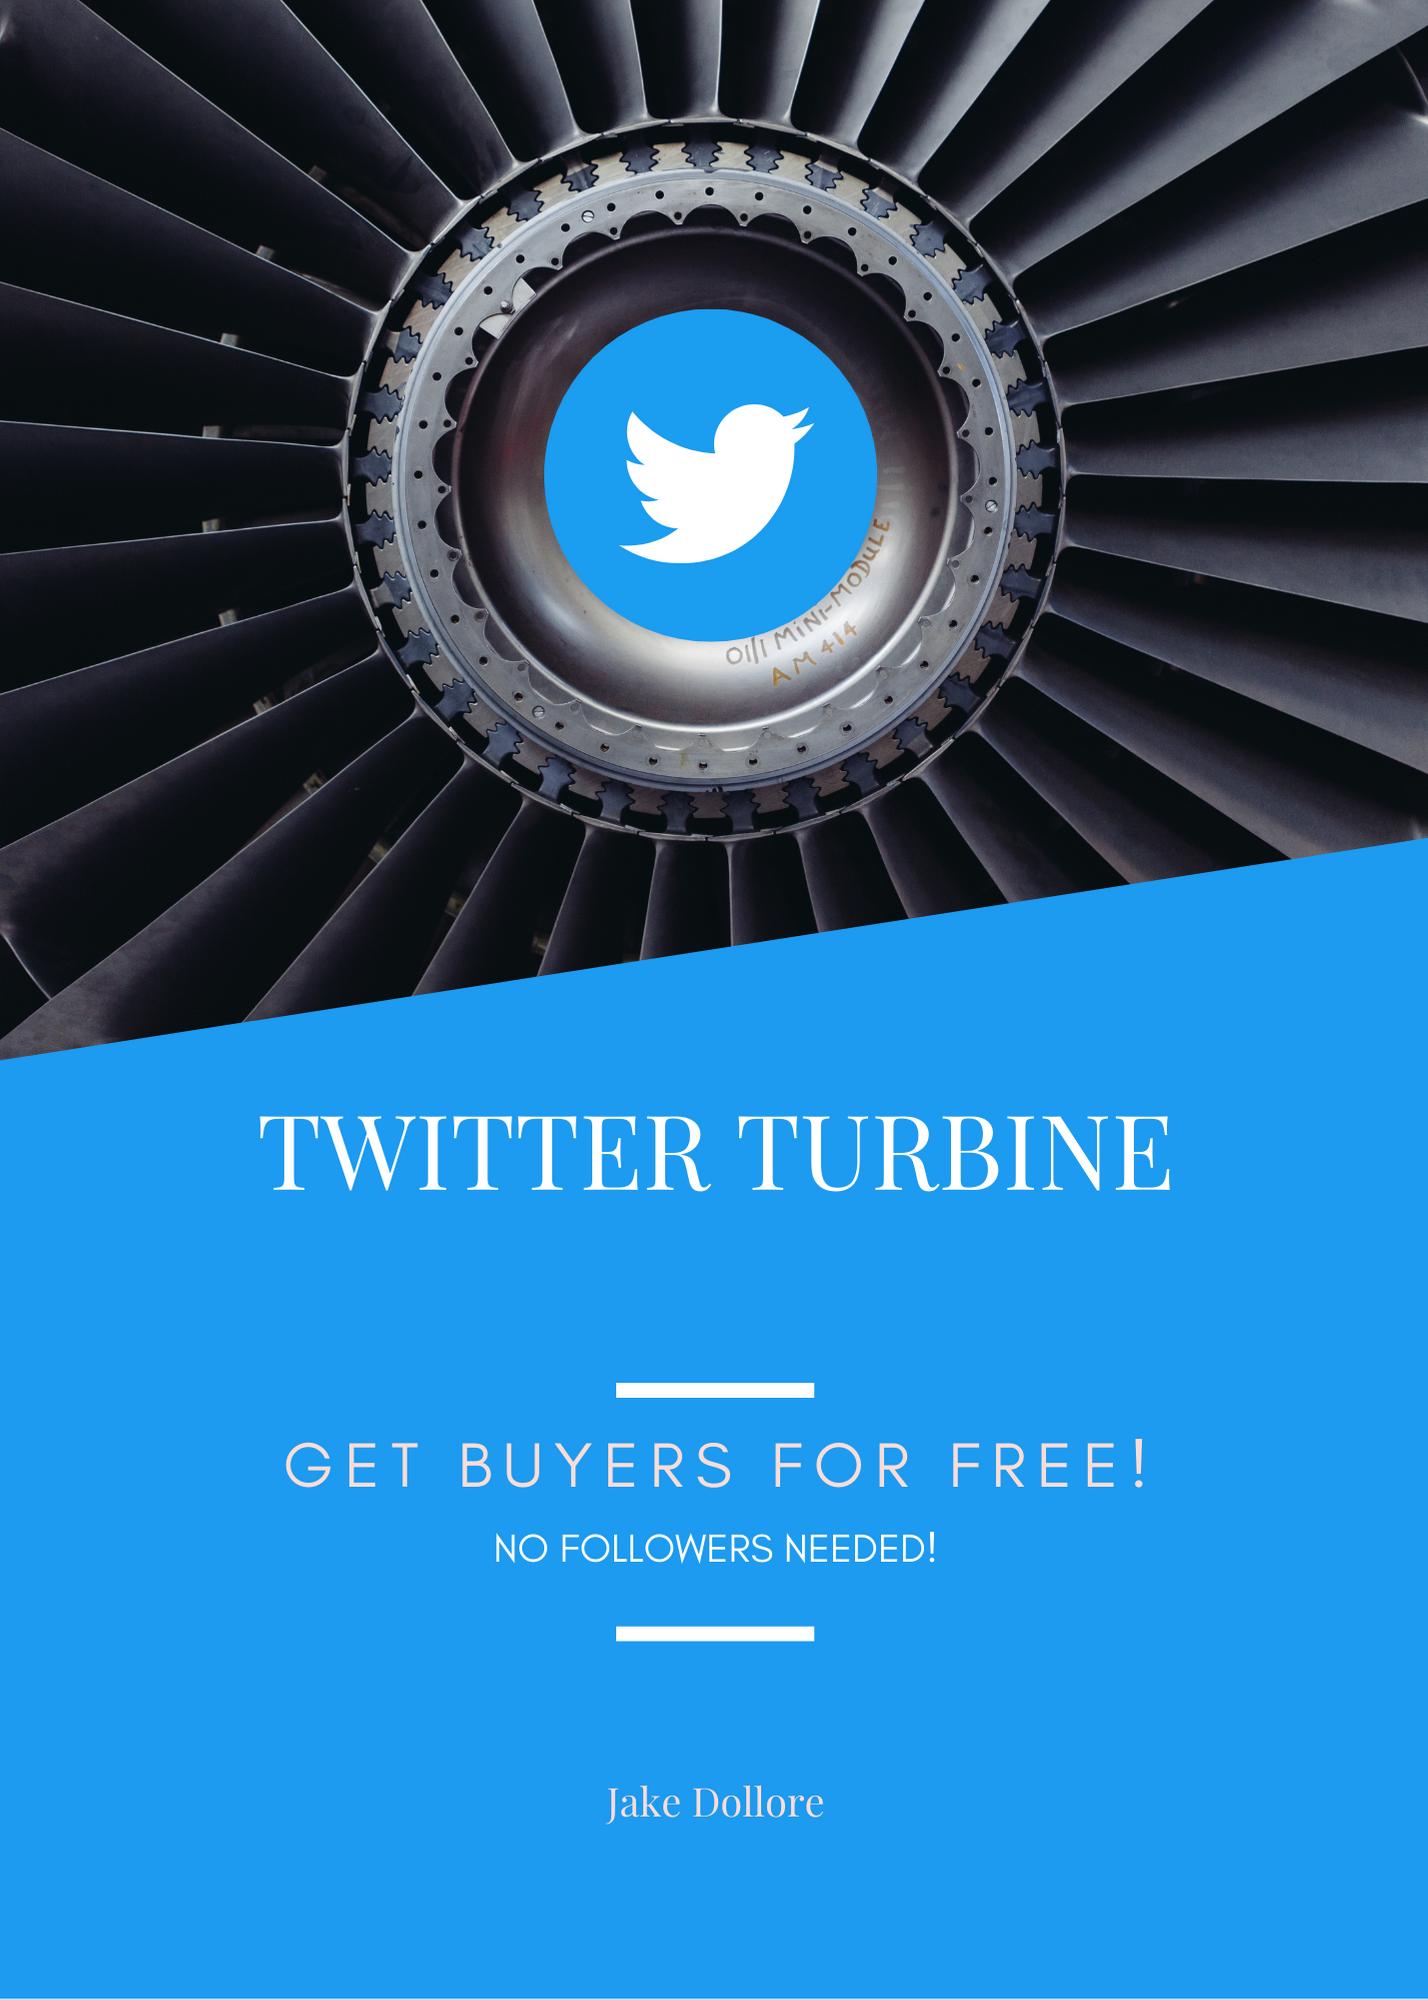 Twitter Turbine - Buyer Traffic From Twitter Free Download